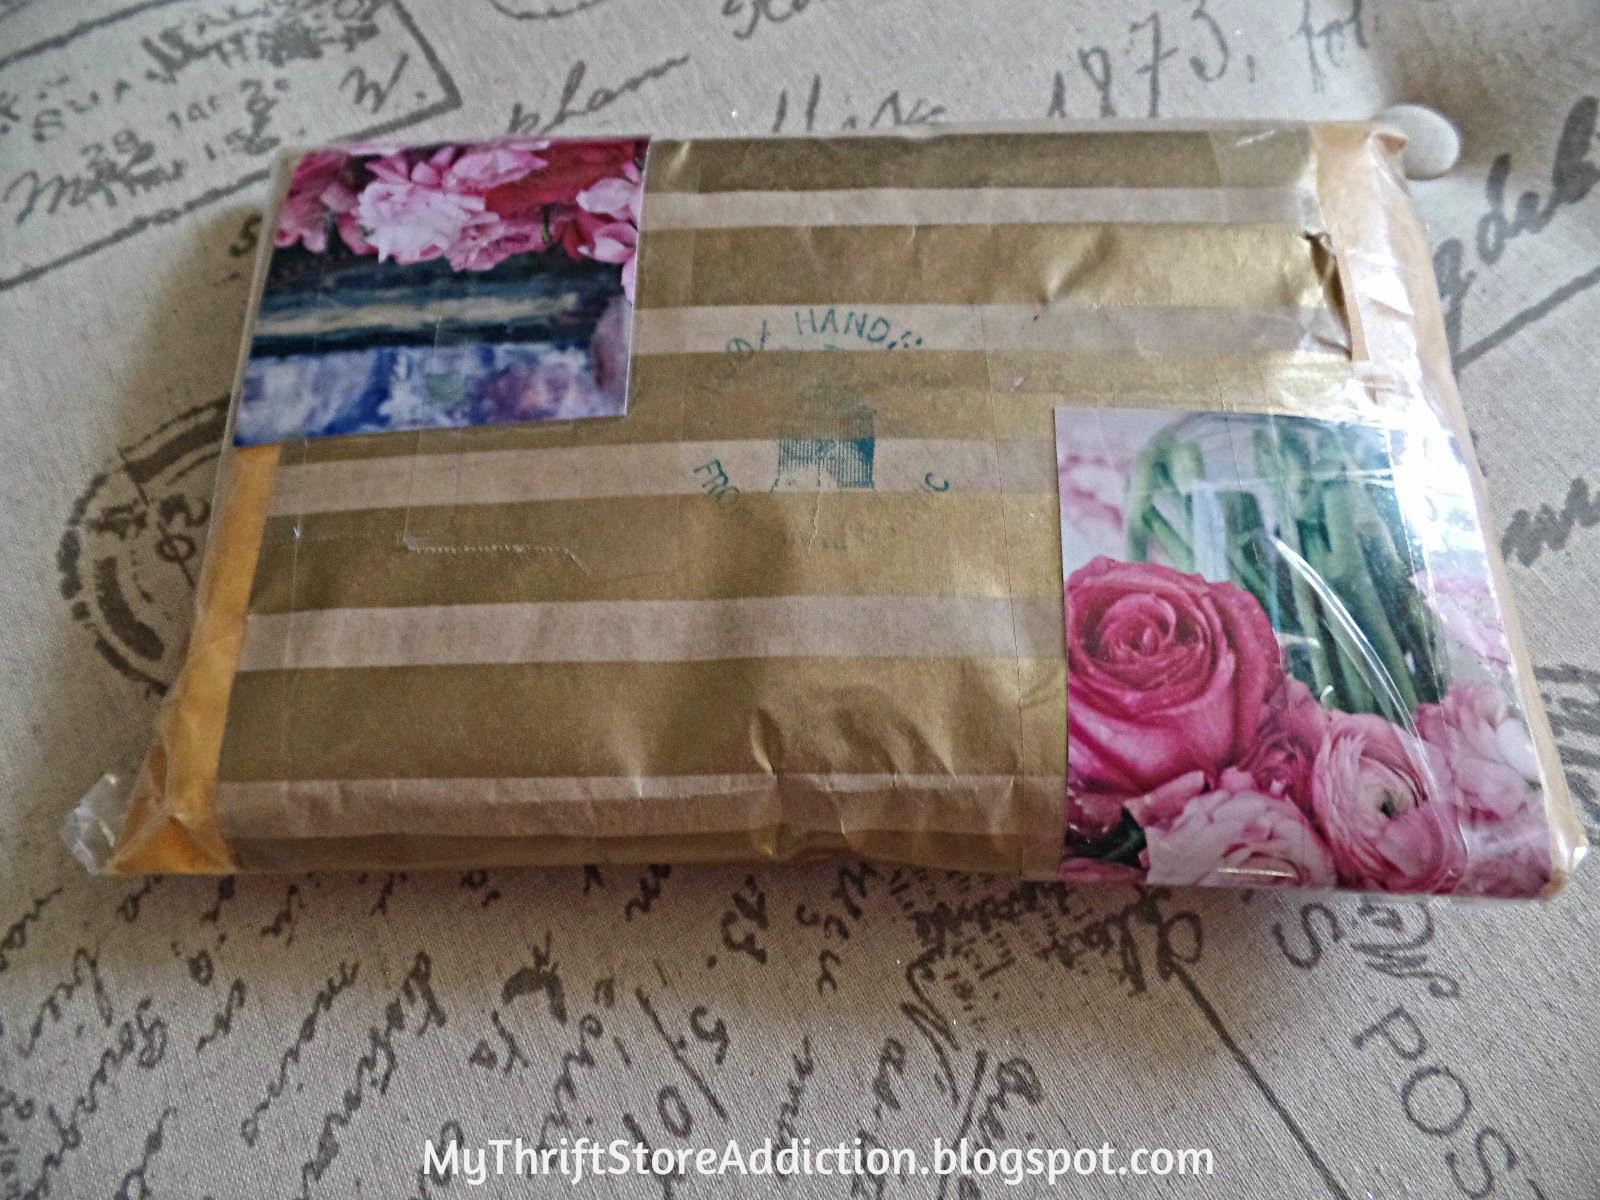 Blogging gift